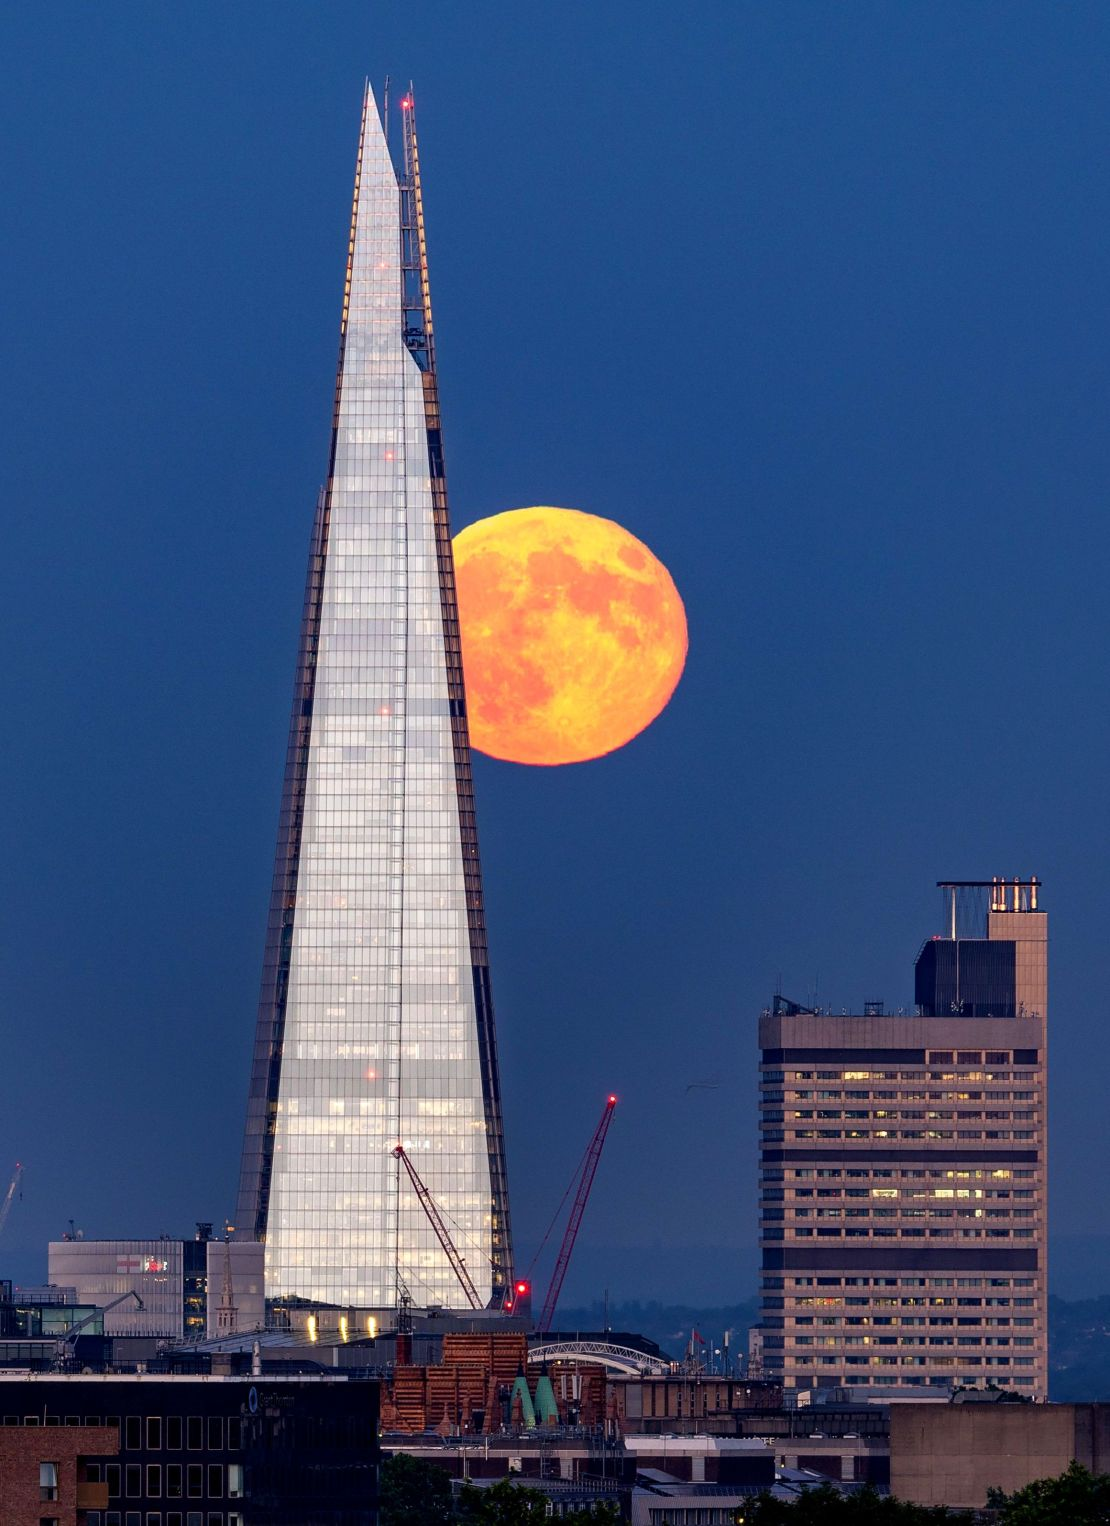 A Strawberry Moon near London's Shard building